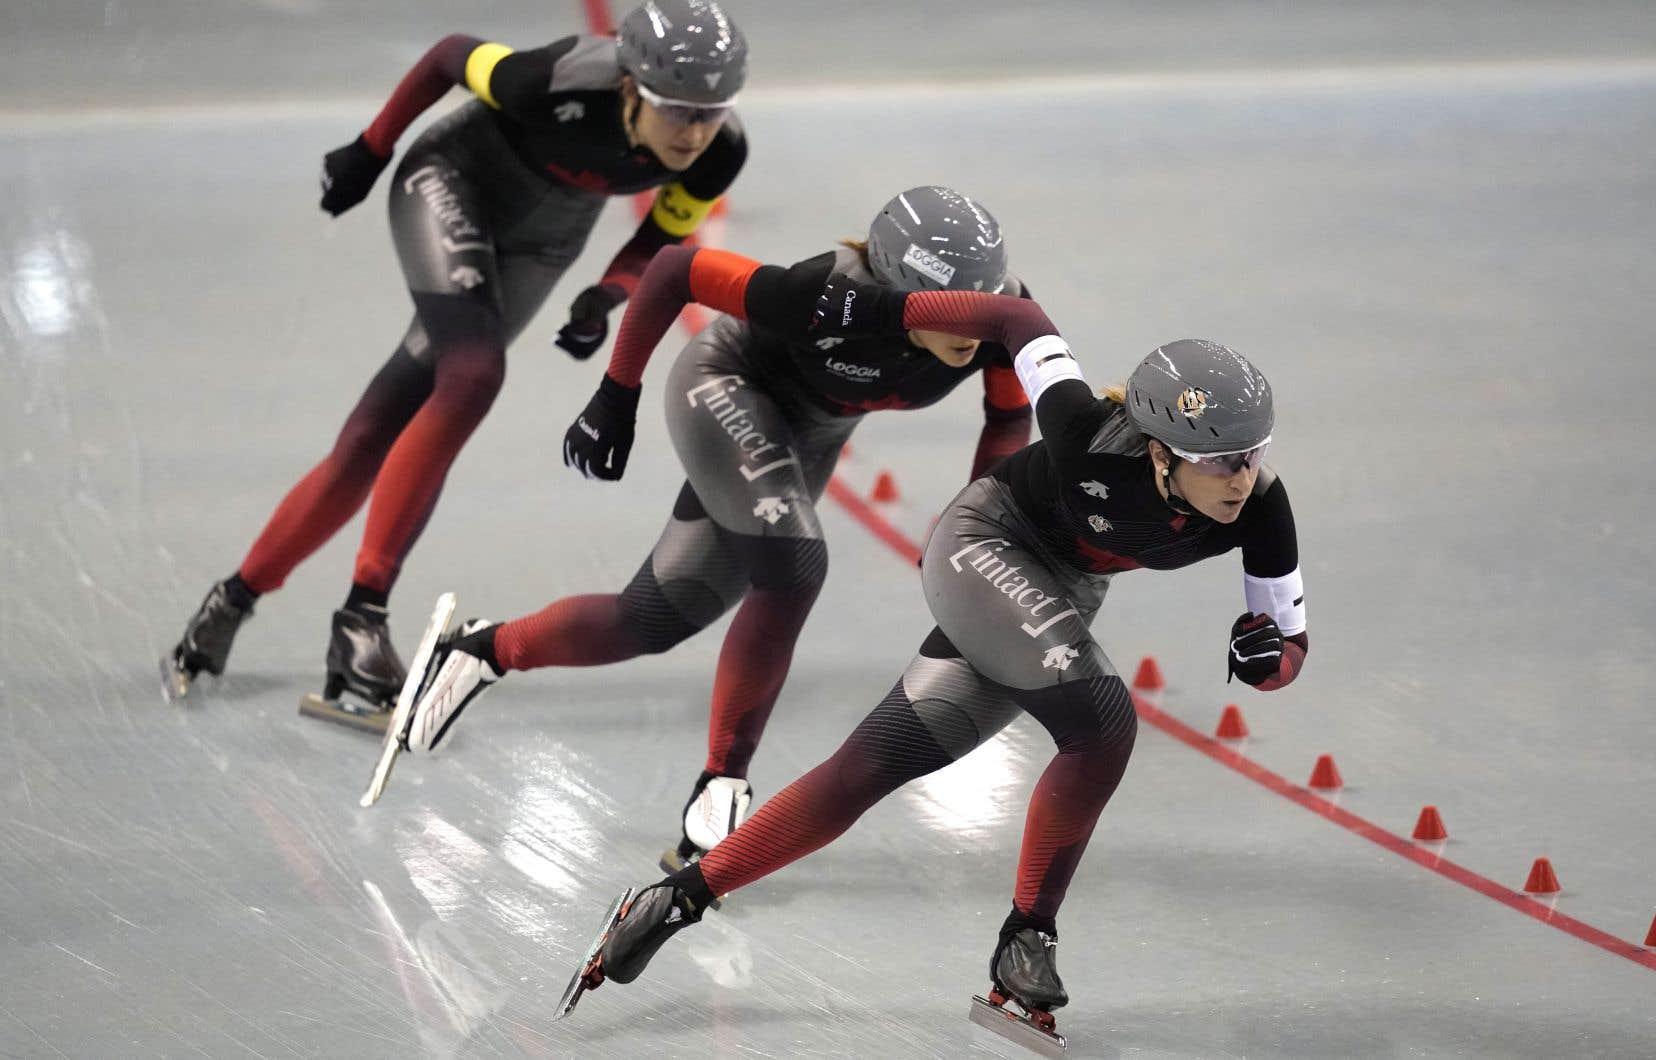 Les patineusesIvanie Blondin, Isabelle Weidemann et Valérie Maltais